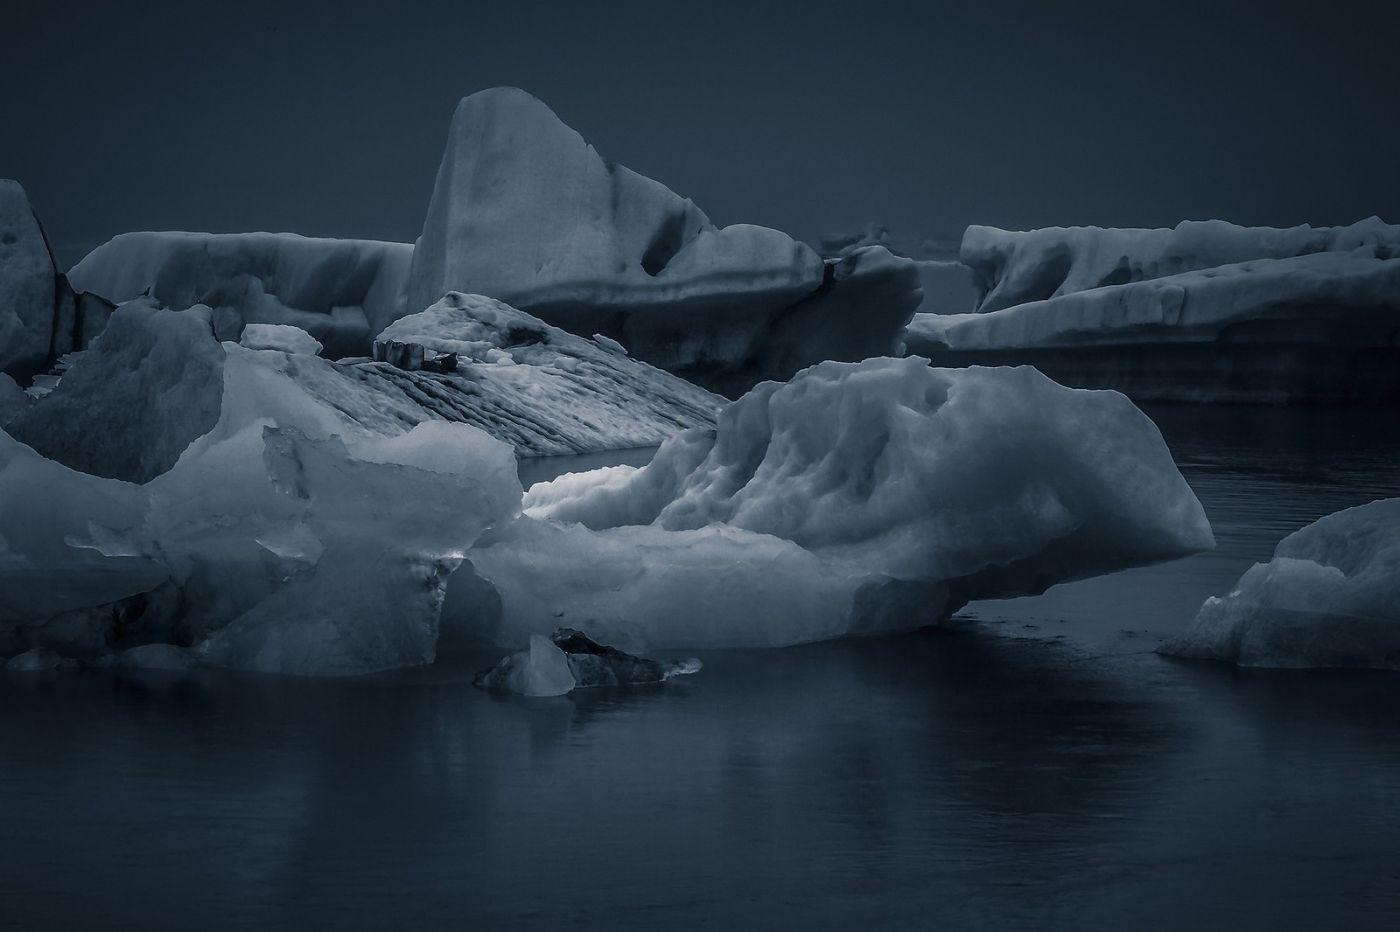 冰岛冰川泻湖(Glacier Lagoon),流动的冰川_图1-24